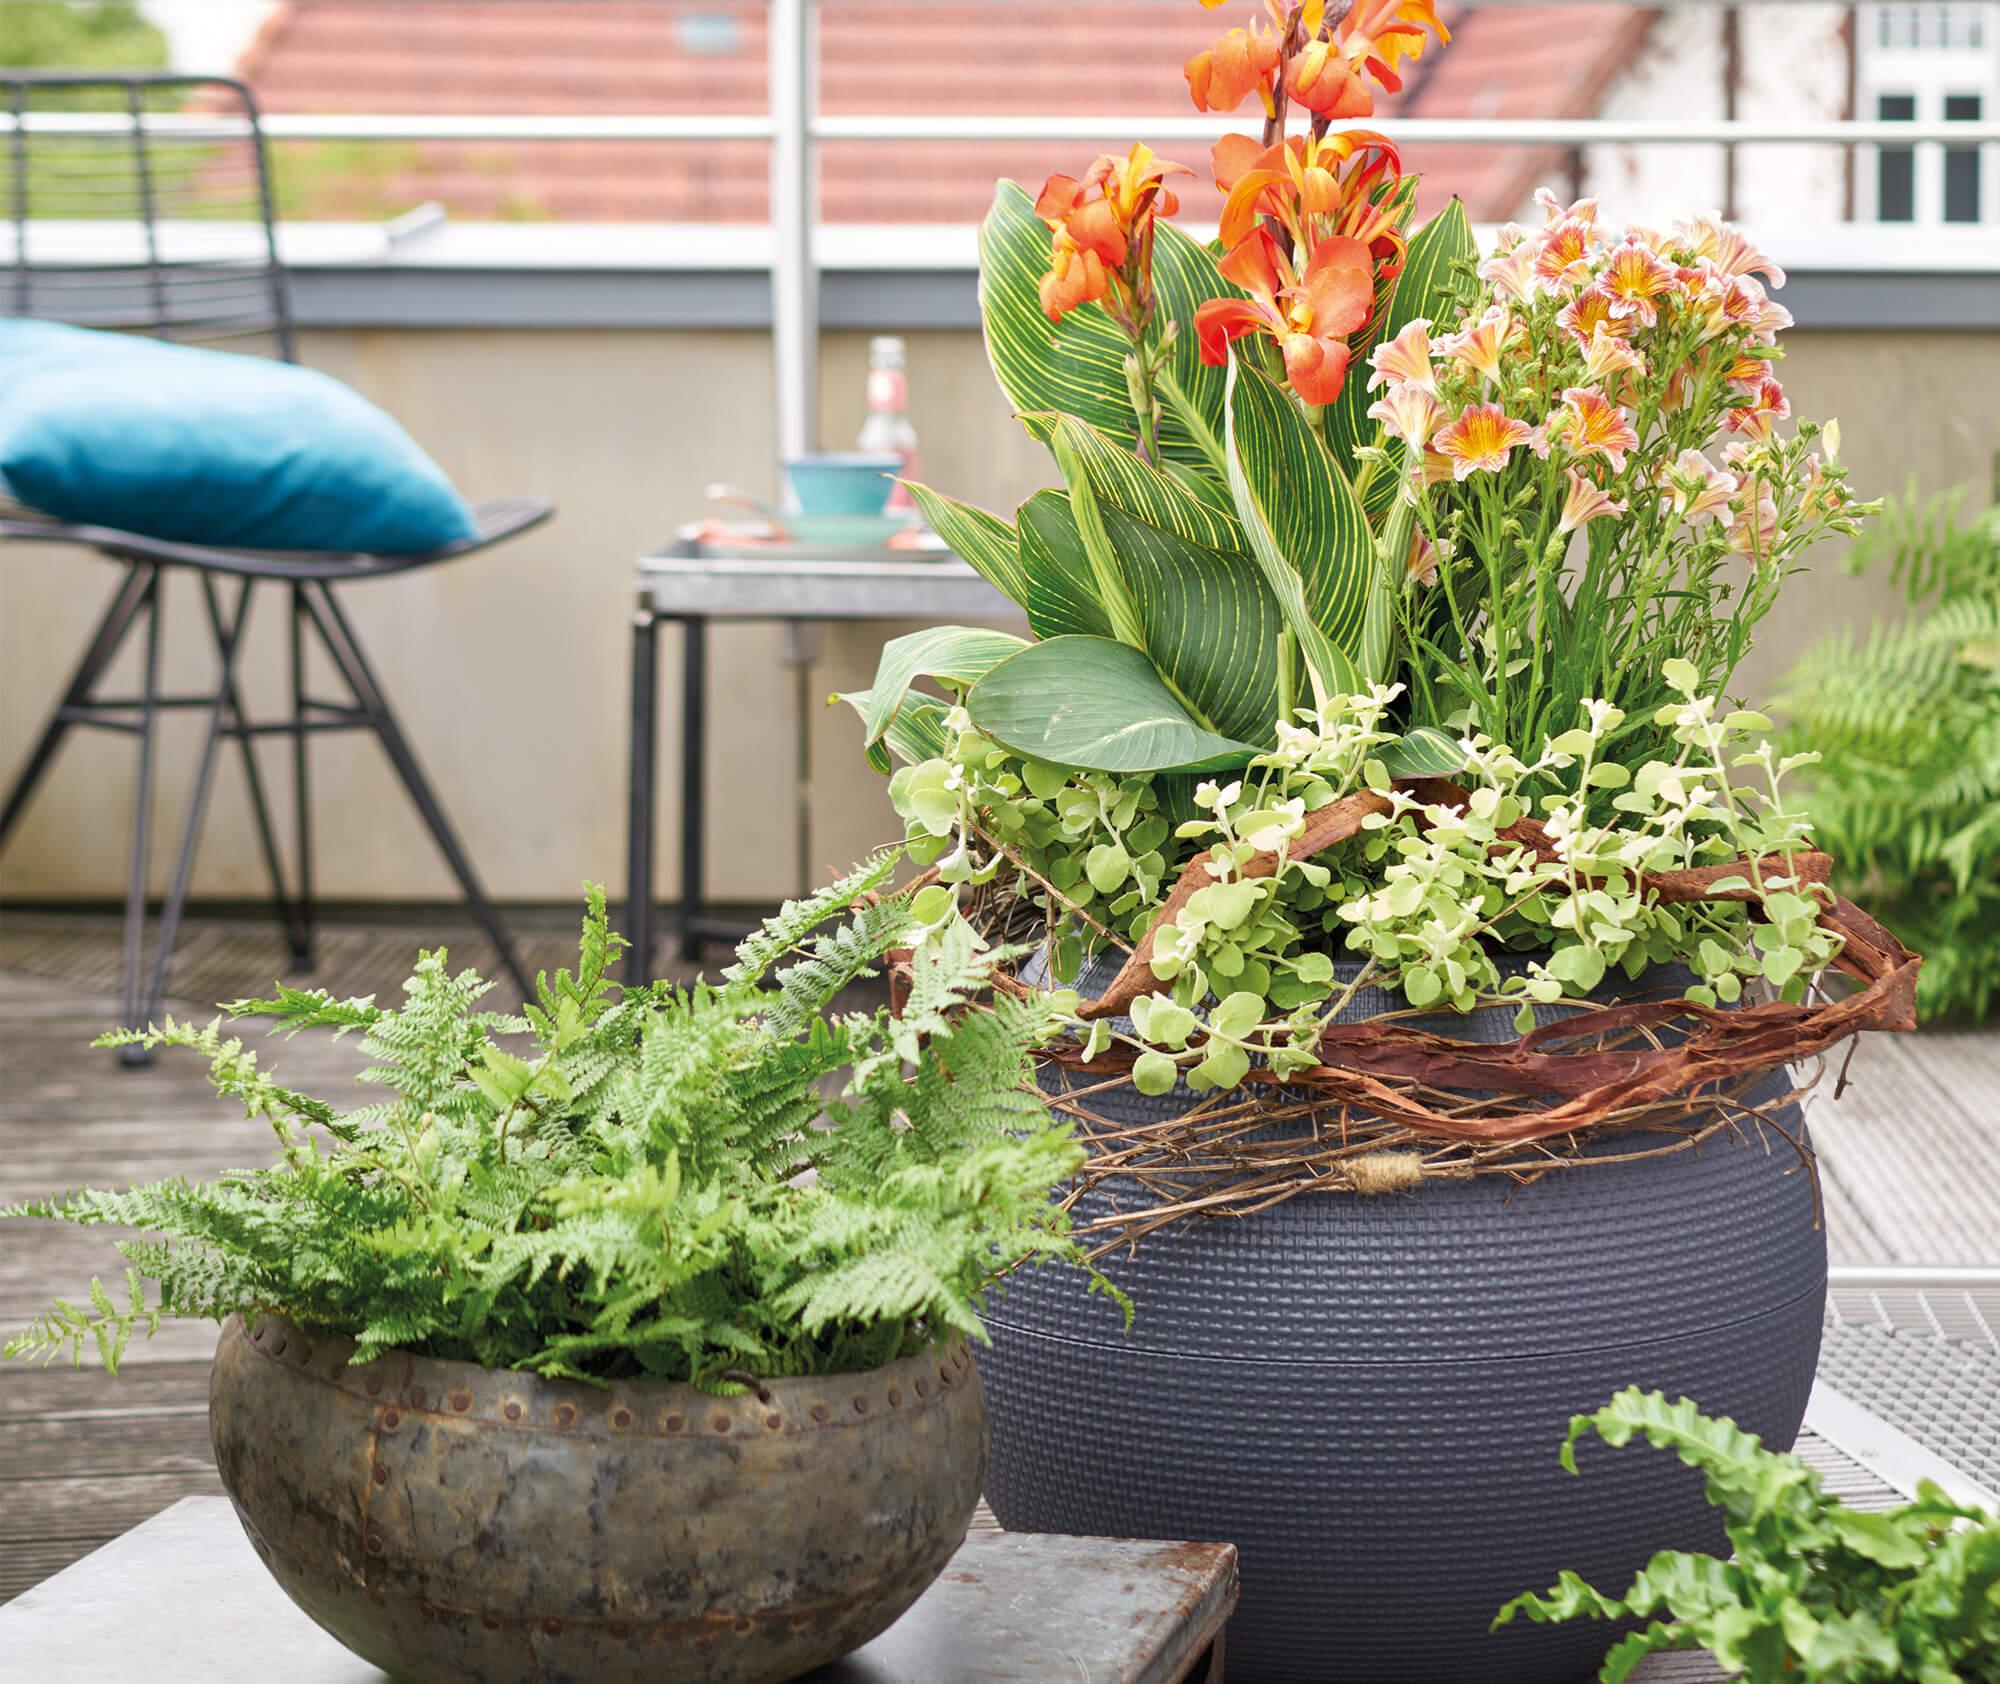 le_tw-urban-gardening_puro_gr.png